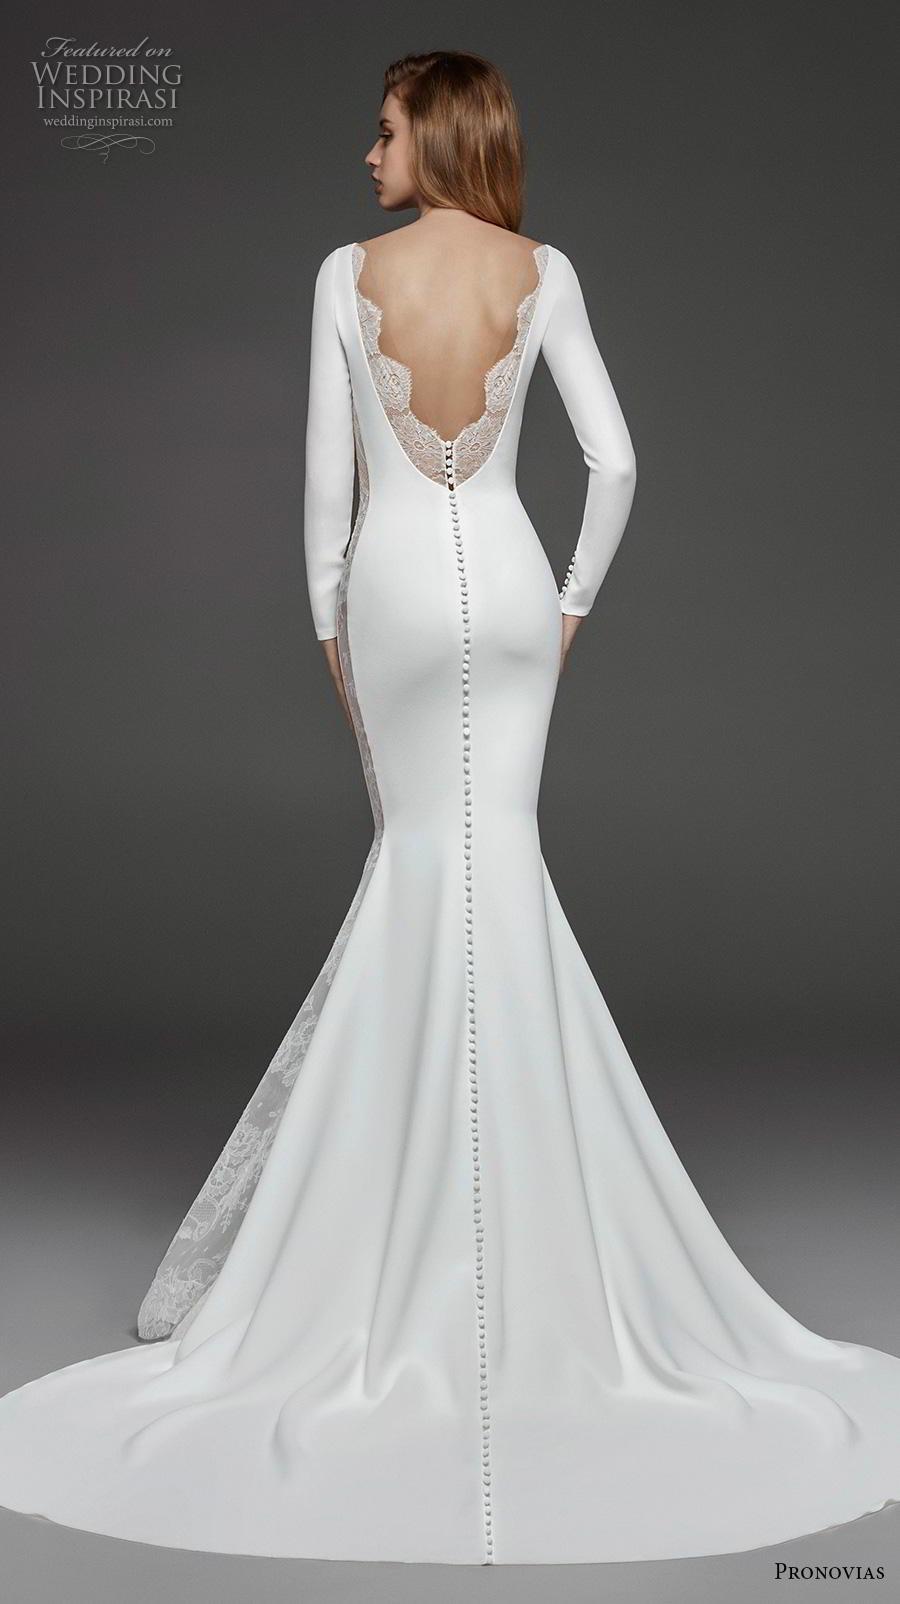 atelier pronovias 2019 bridal long sleeves bateau neckline simple minimalist elegant fit and flare wedding dress backless low v back chapel train (19) bv